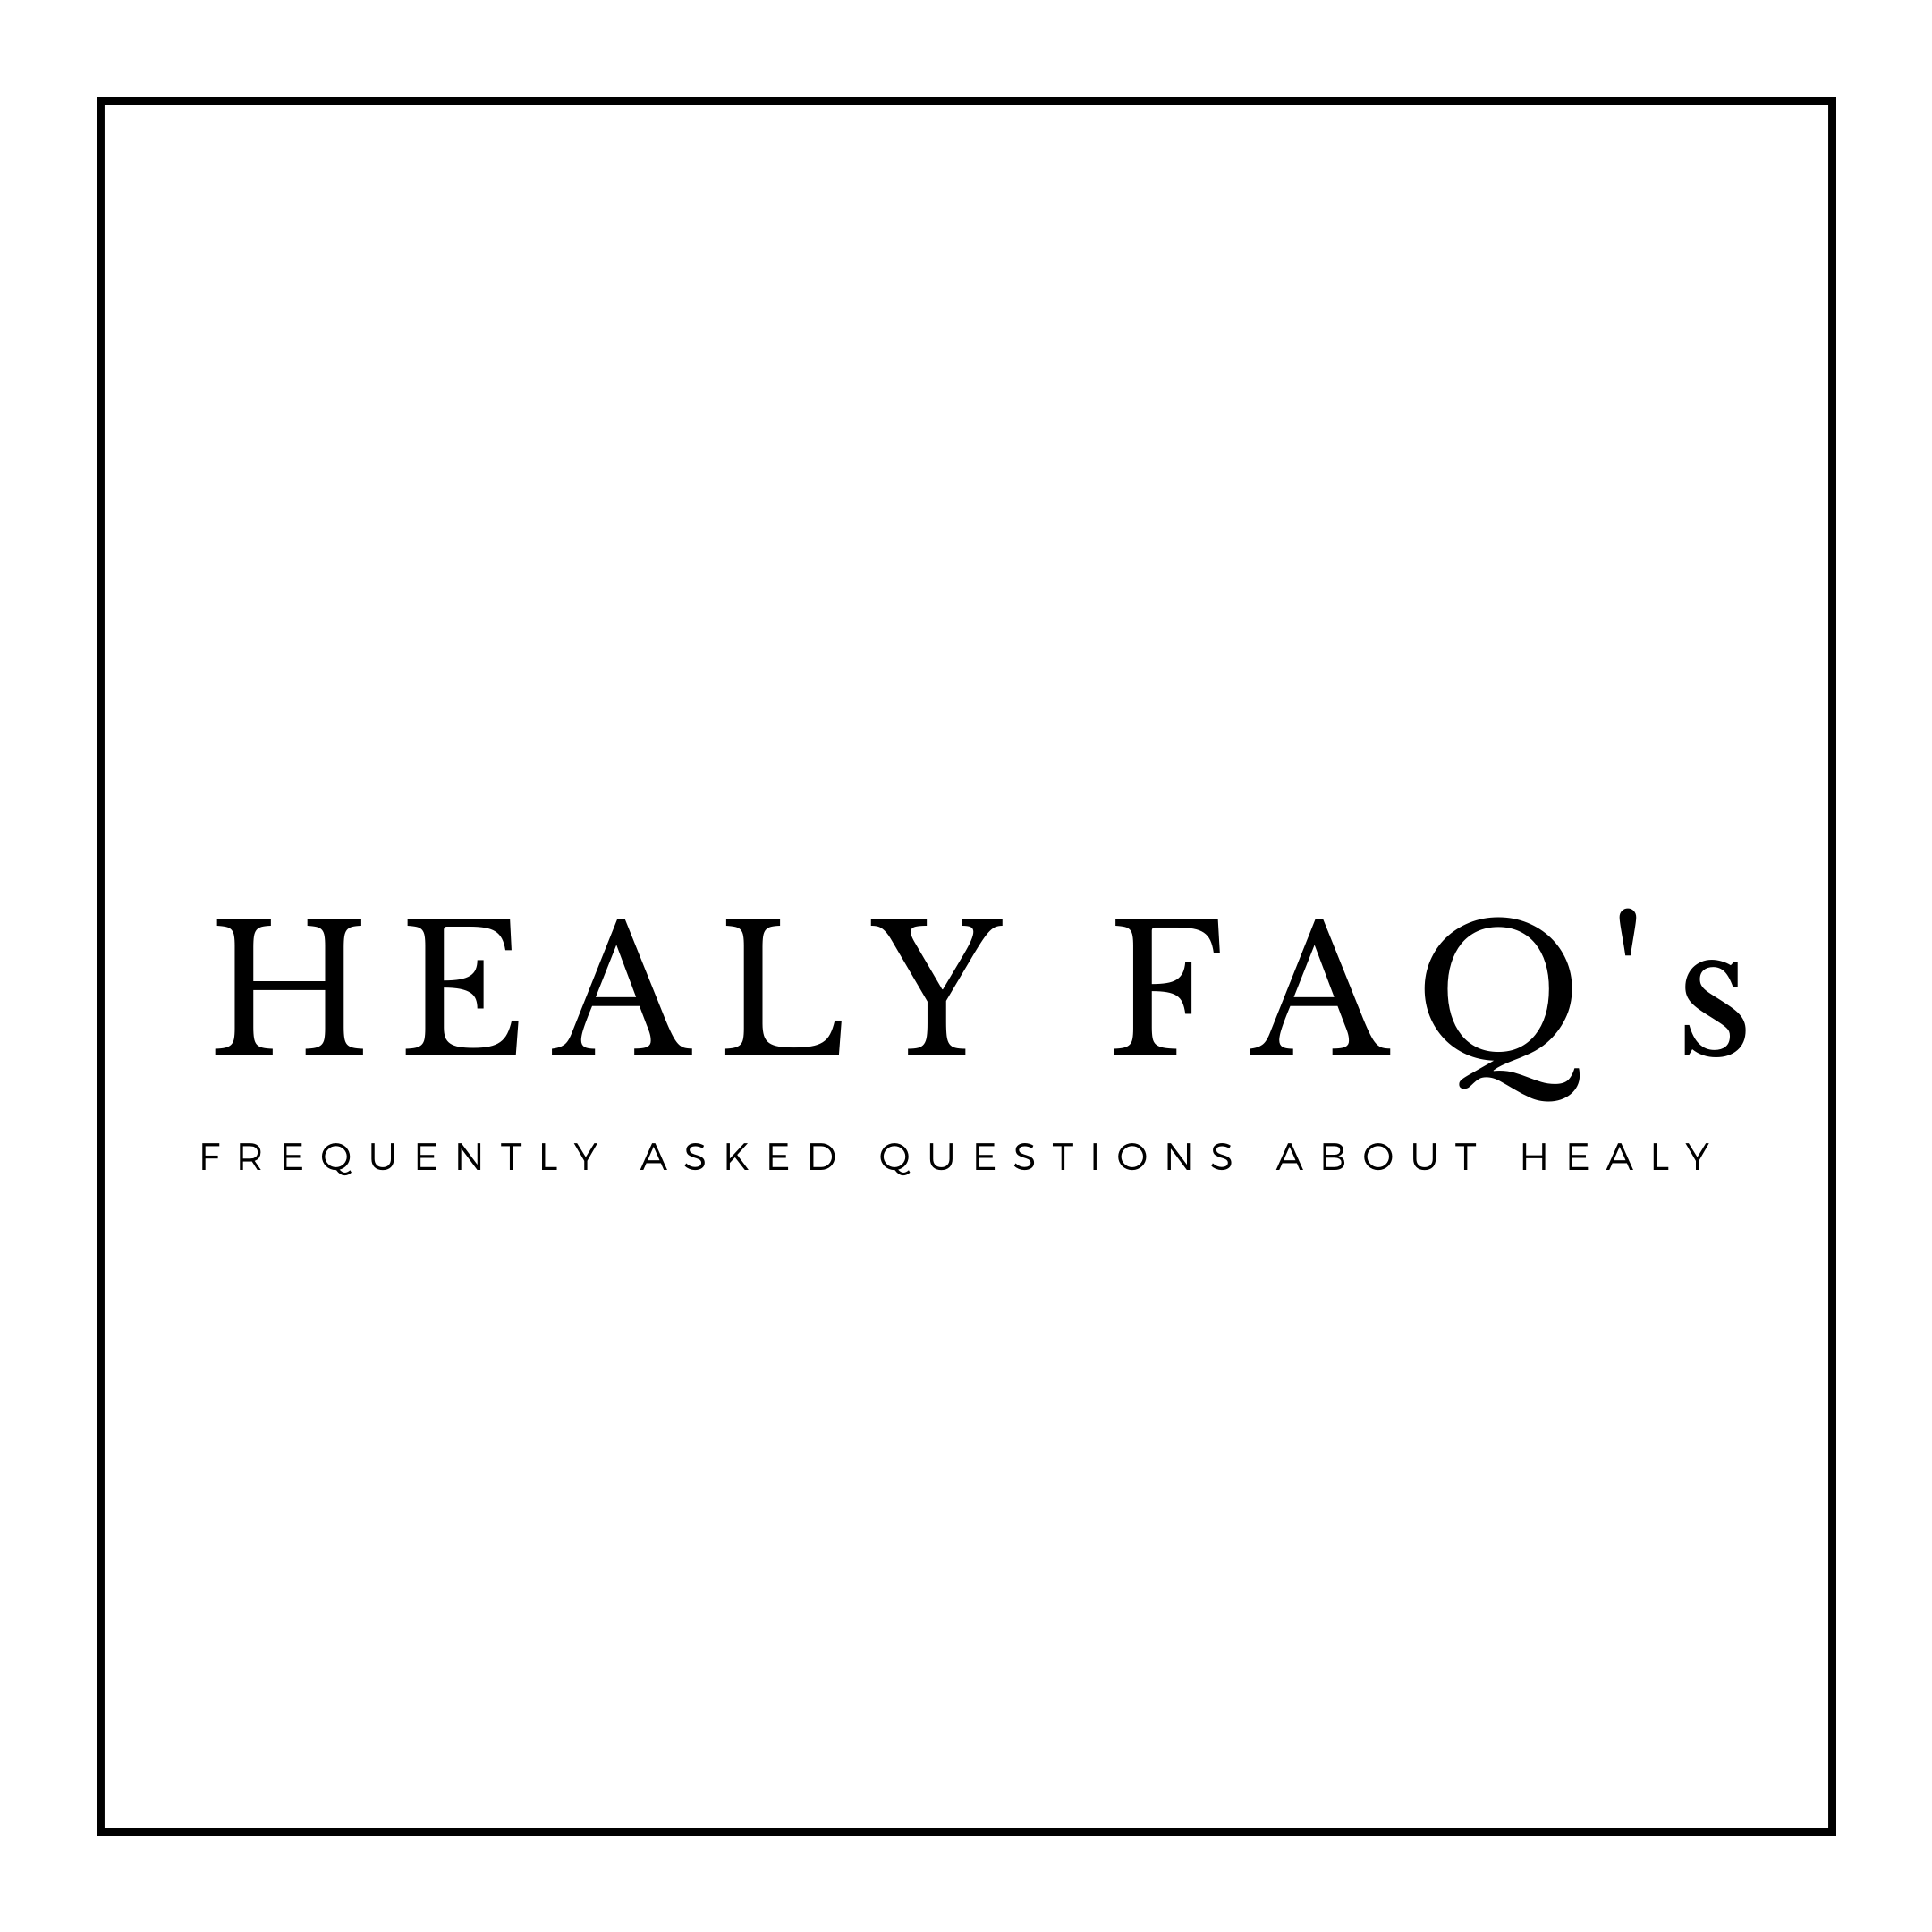 Healy FAQs